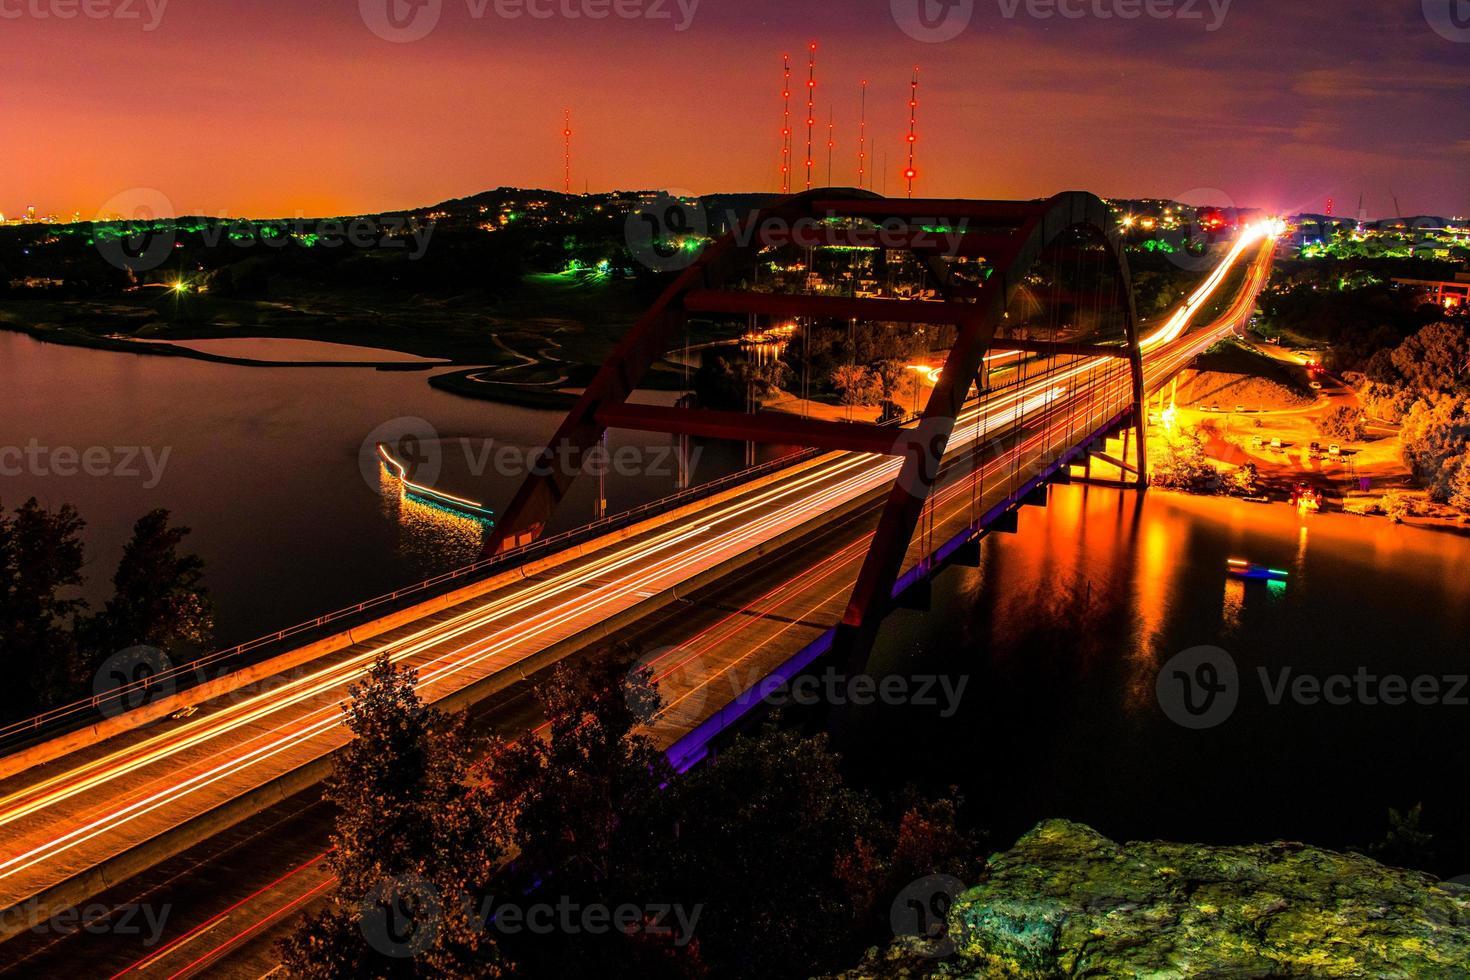 nacht 360 brug pennybacker austin lange blootstelling paden de hele nacht foto